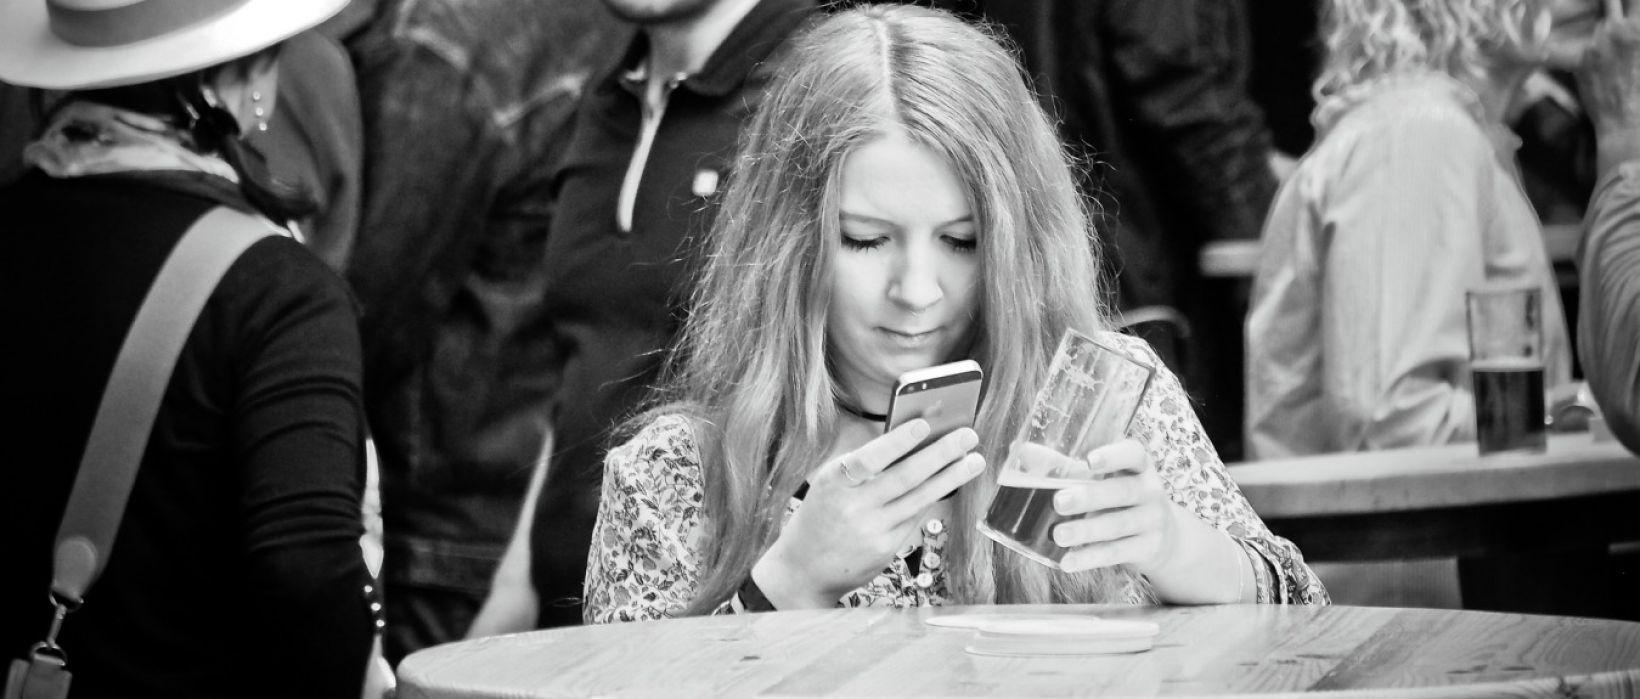 Photo for: Making Sense of Craft Beer Reviews